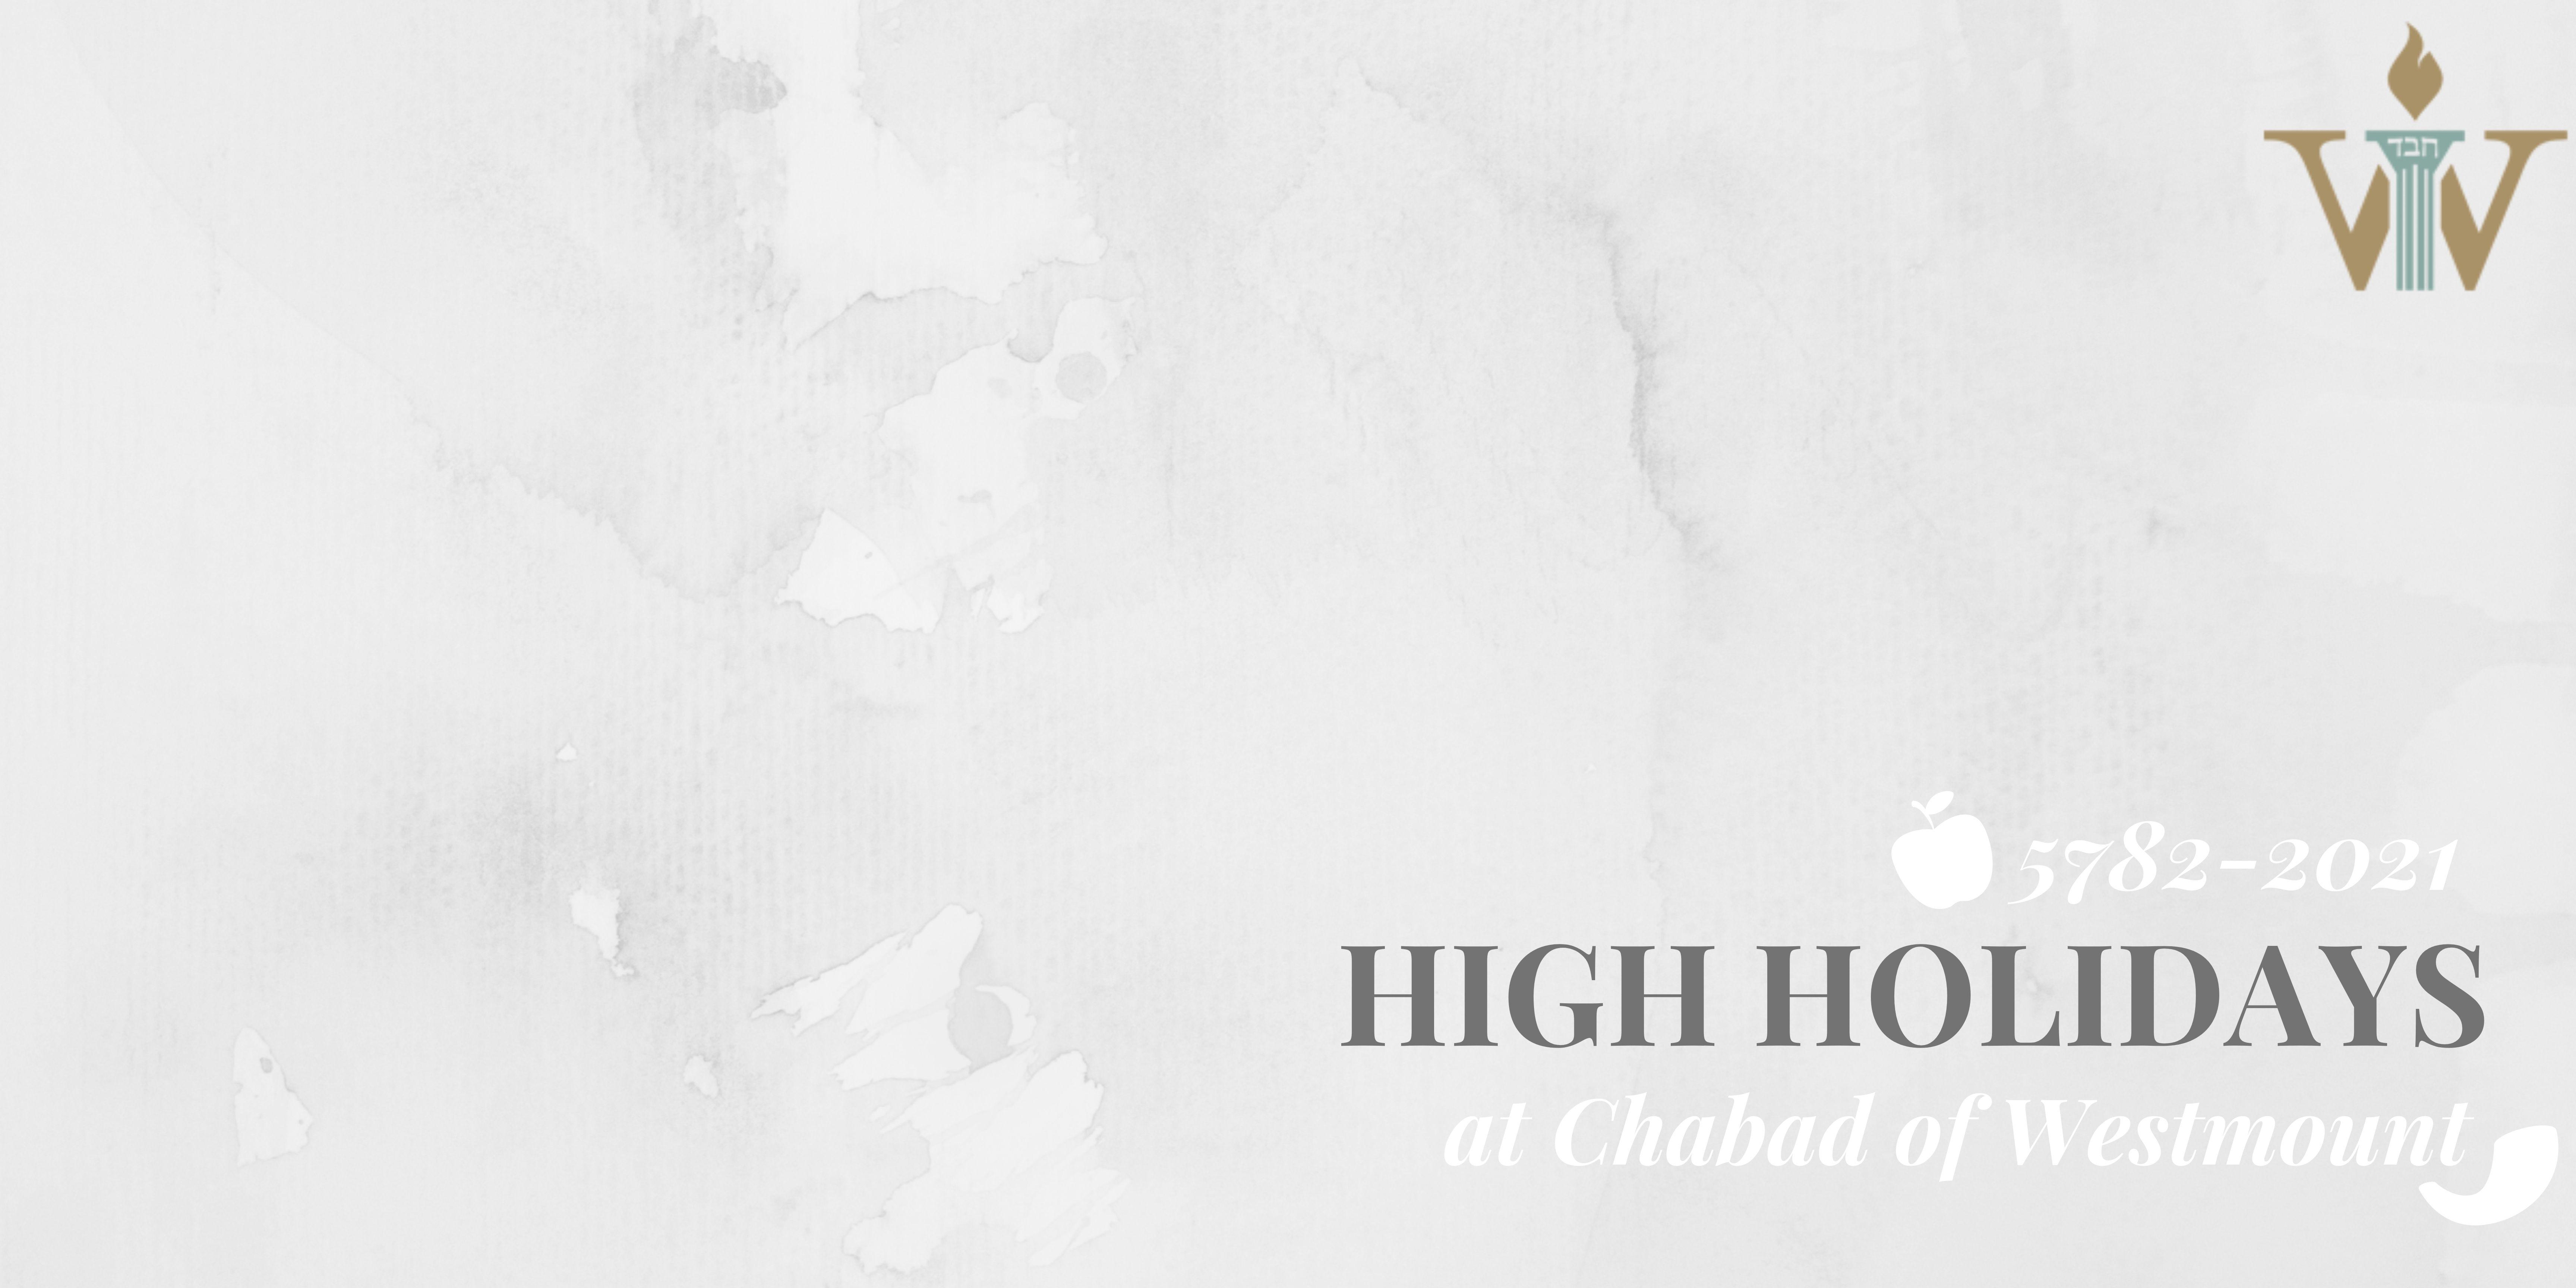 High Holidays | Chabad Westmount